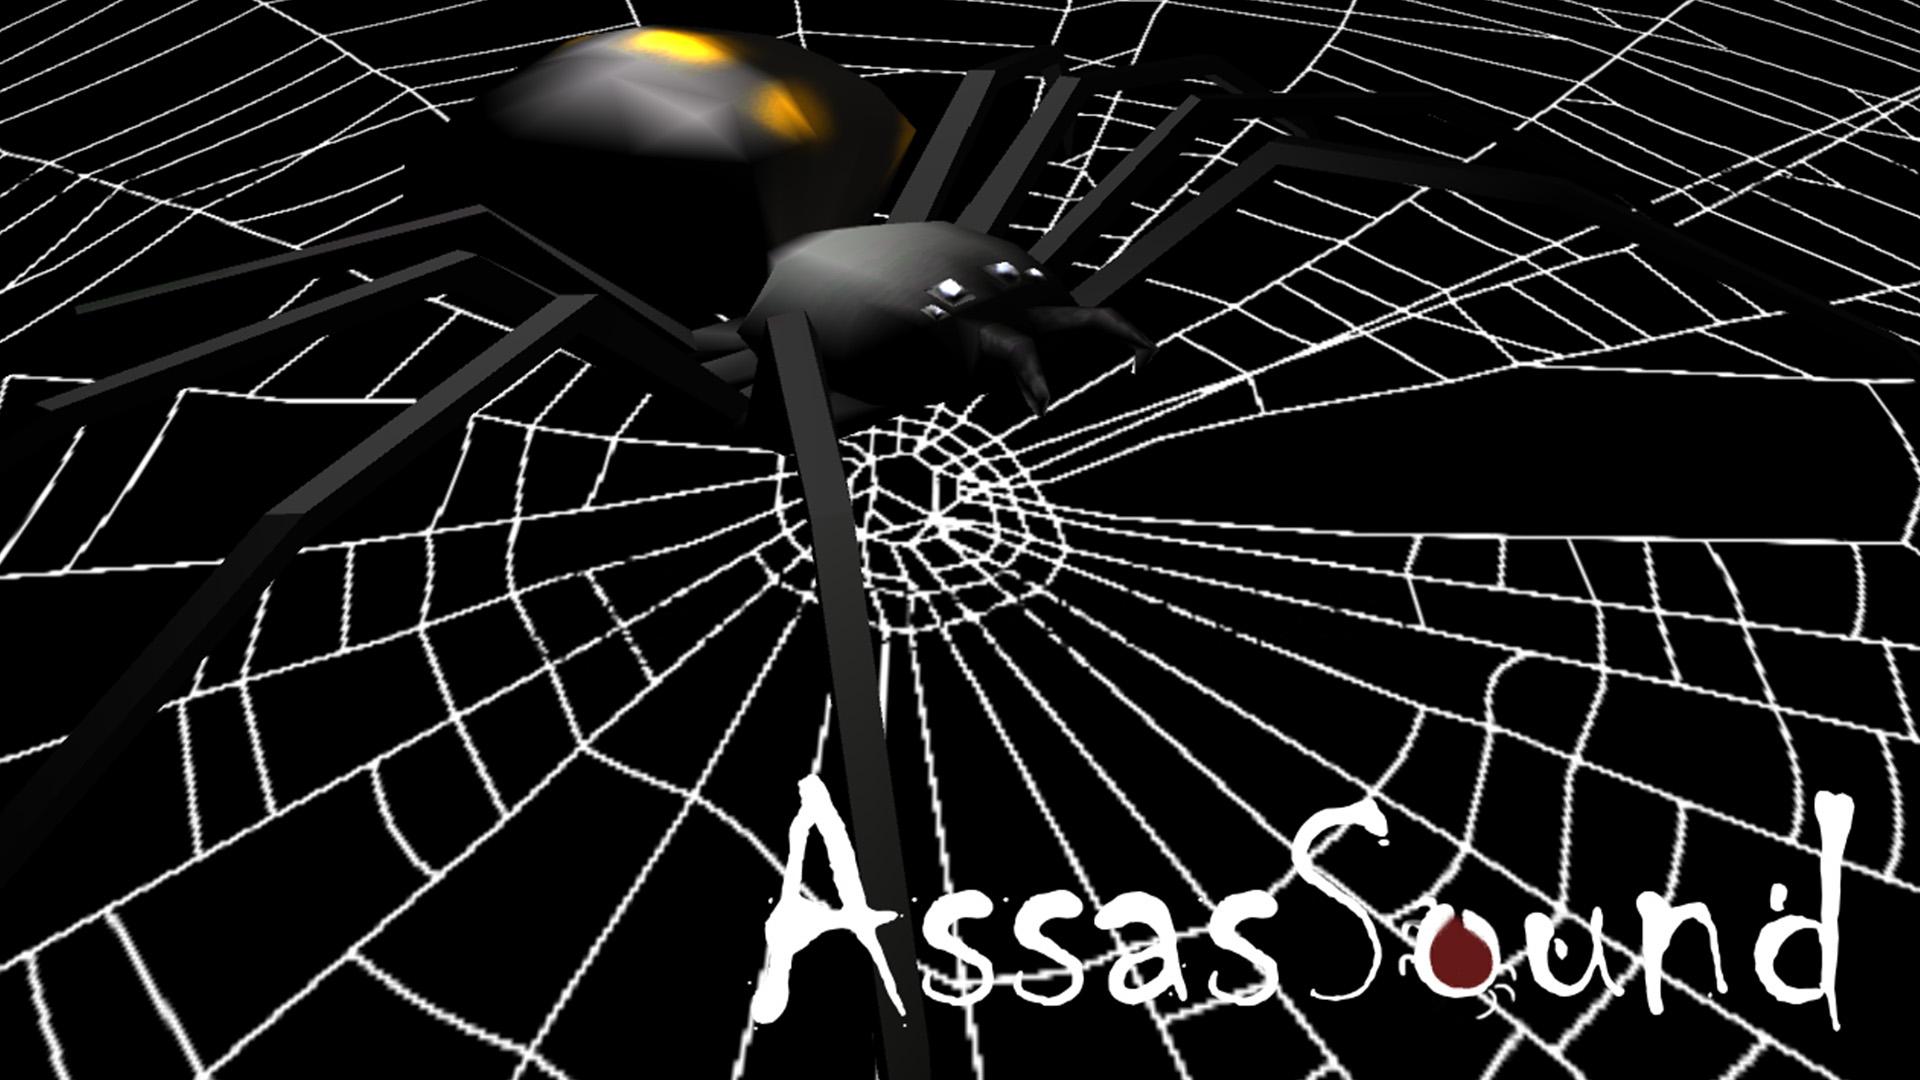 AssasSound